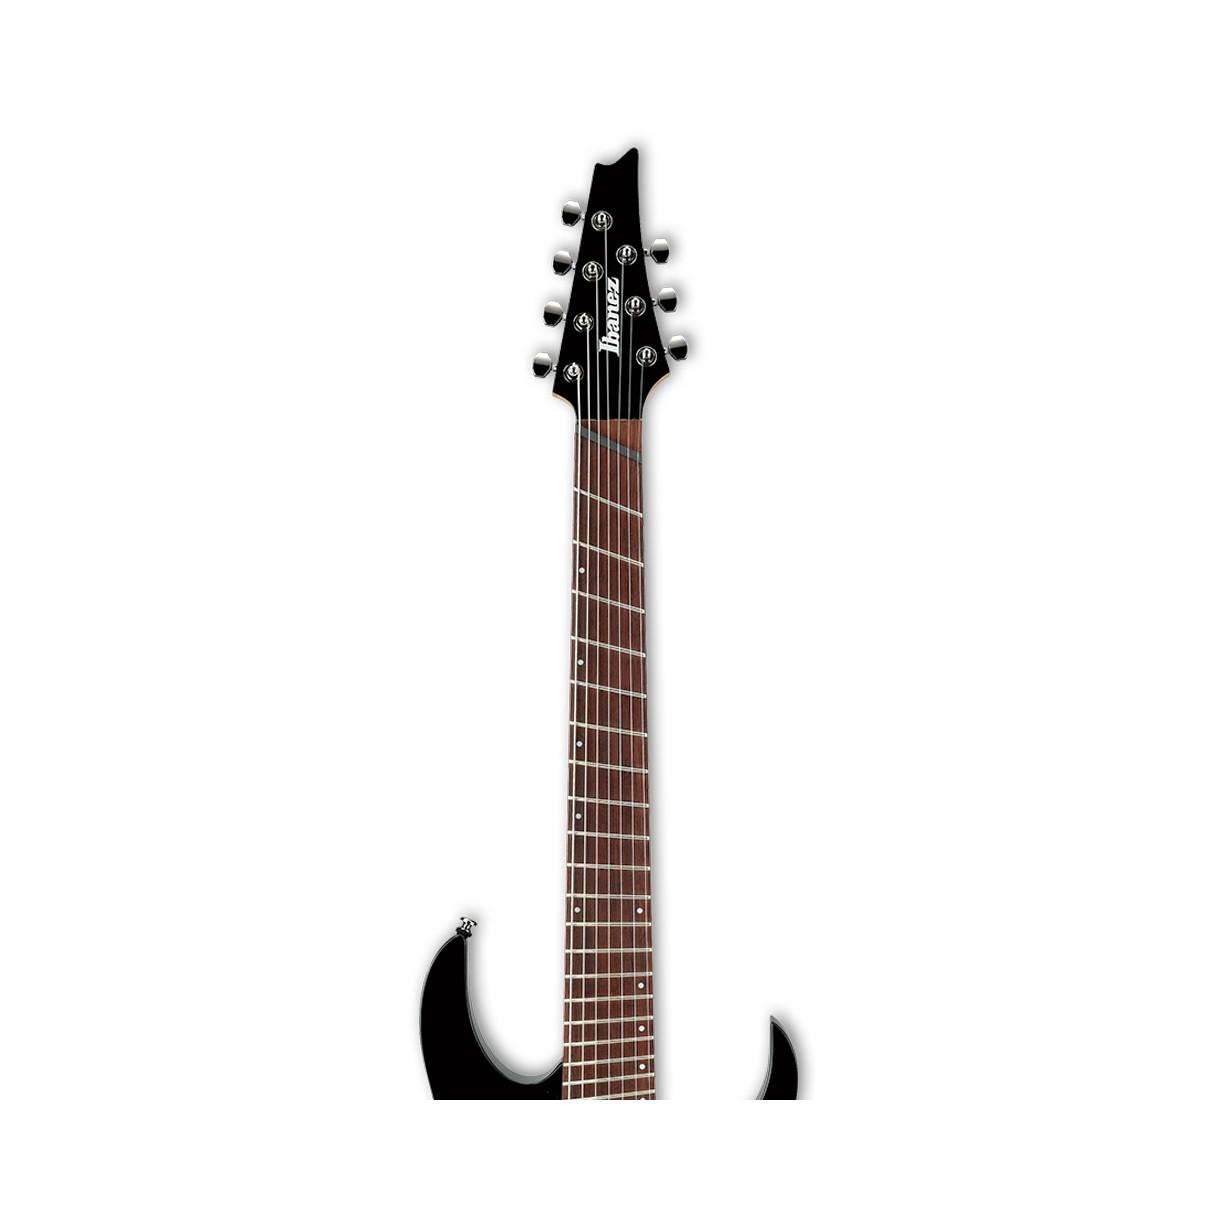 Ibanez RG Multi Scale 7 String Electric Guitar - Black